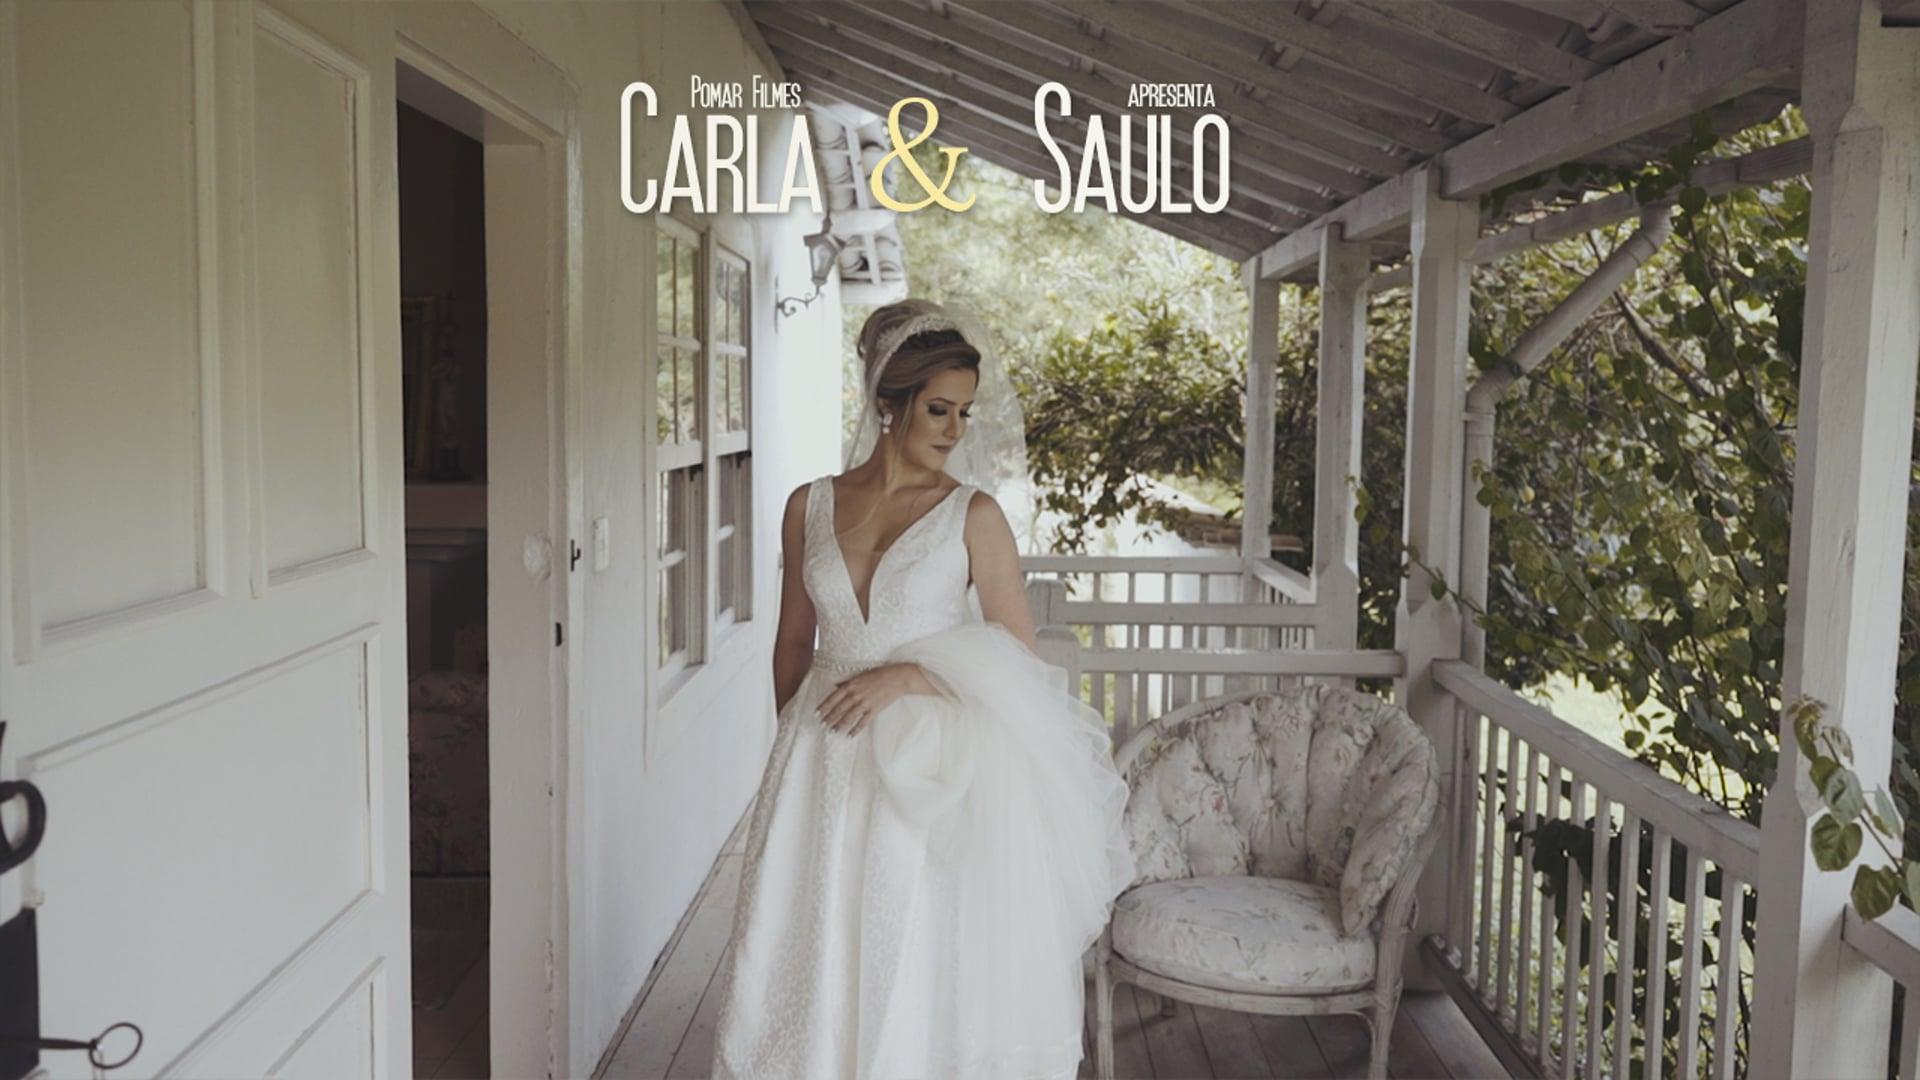 Carla e Saulo - Teaser